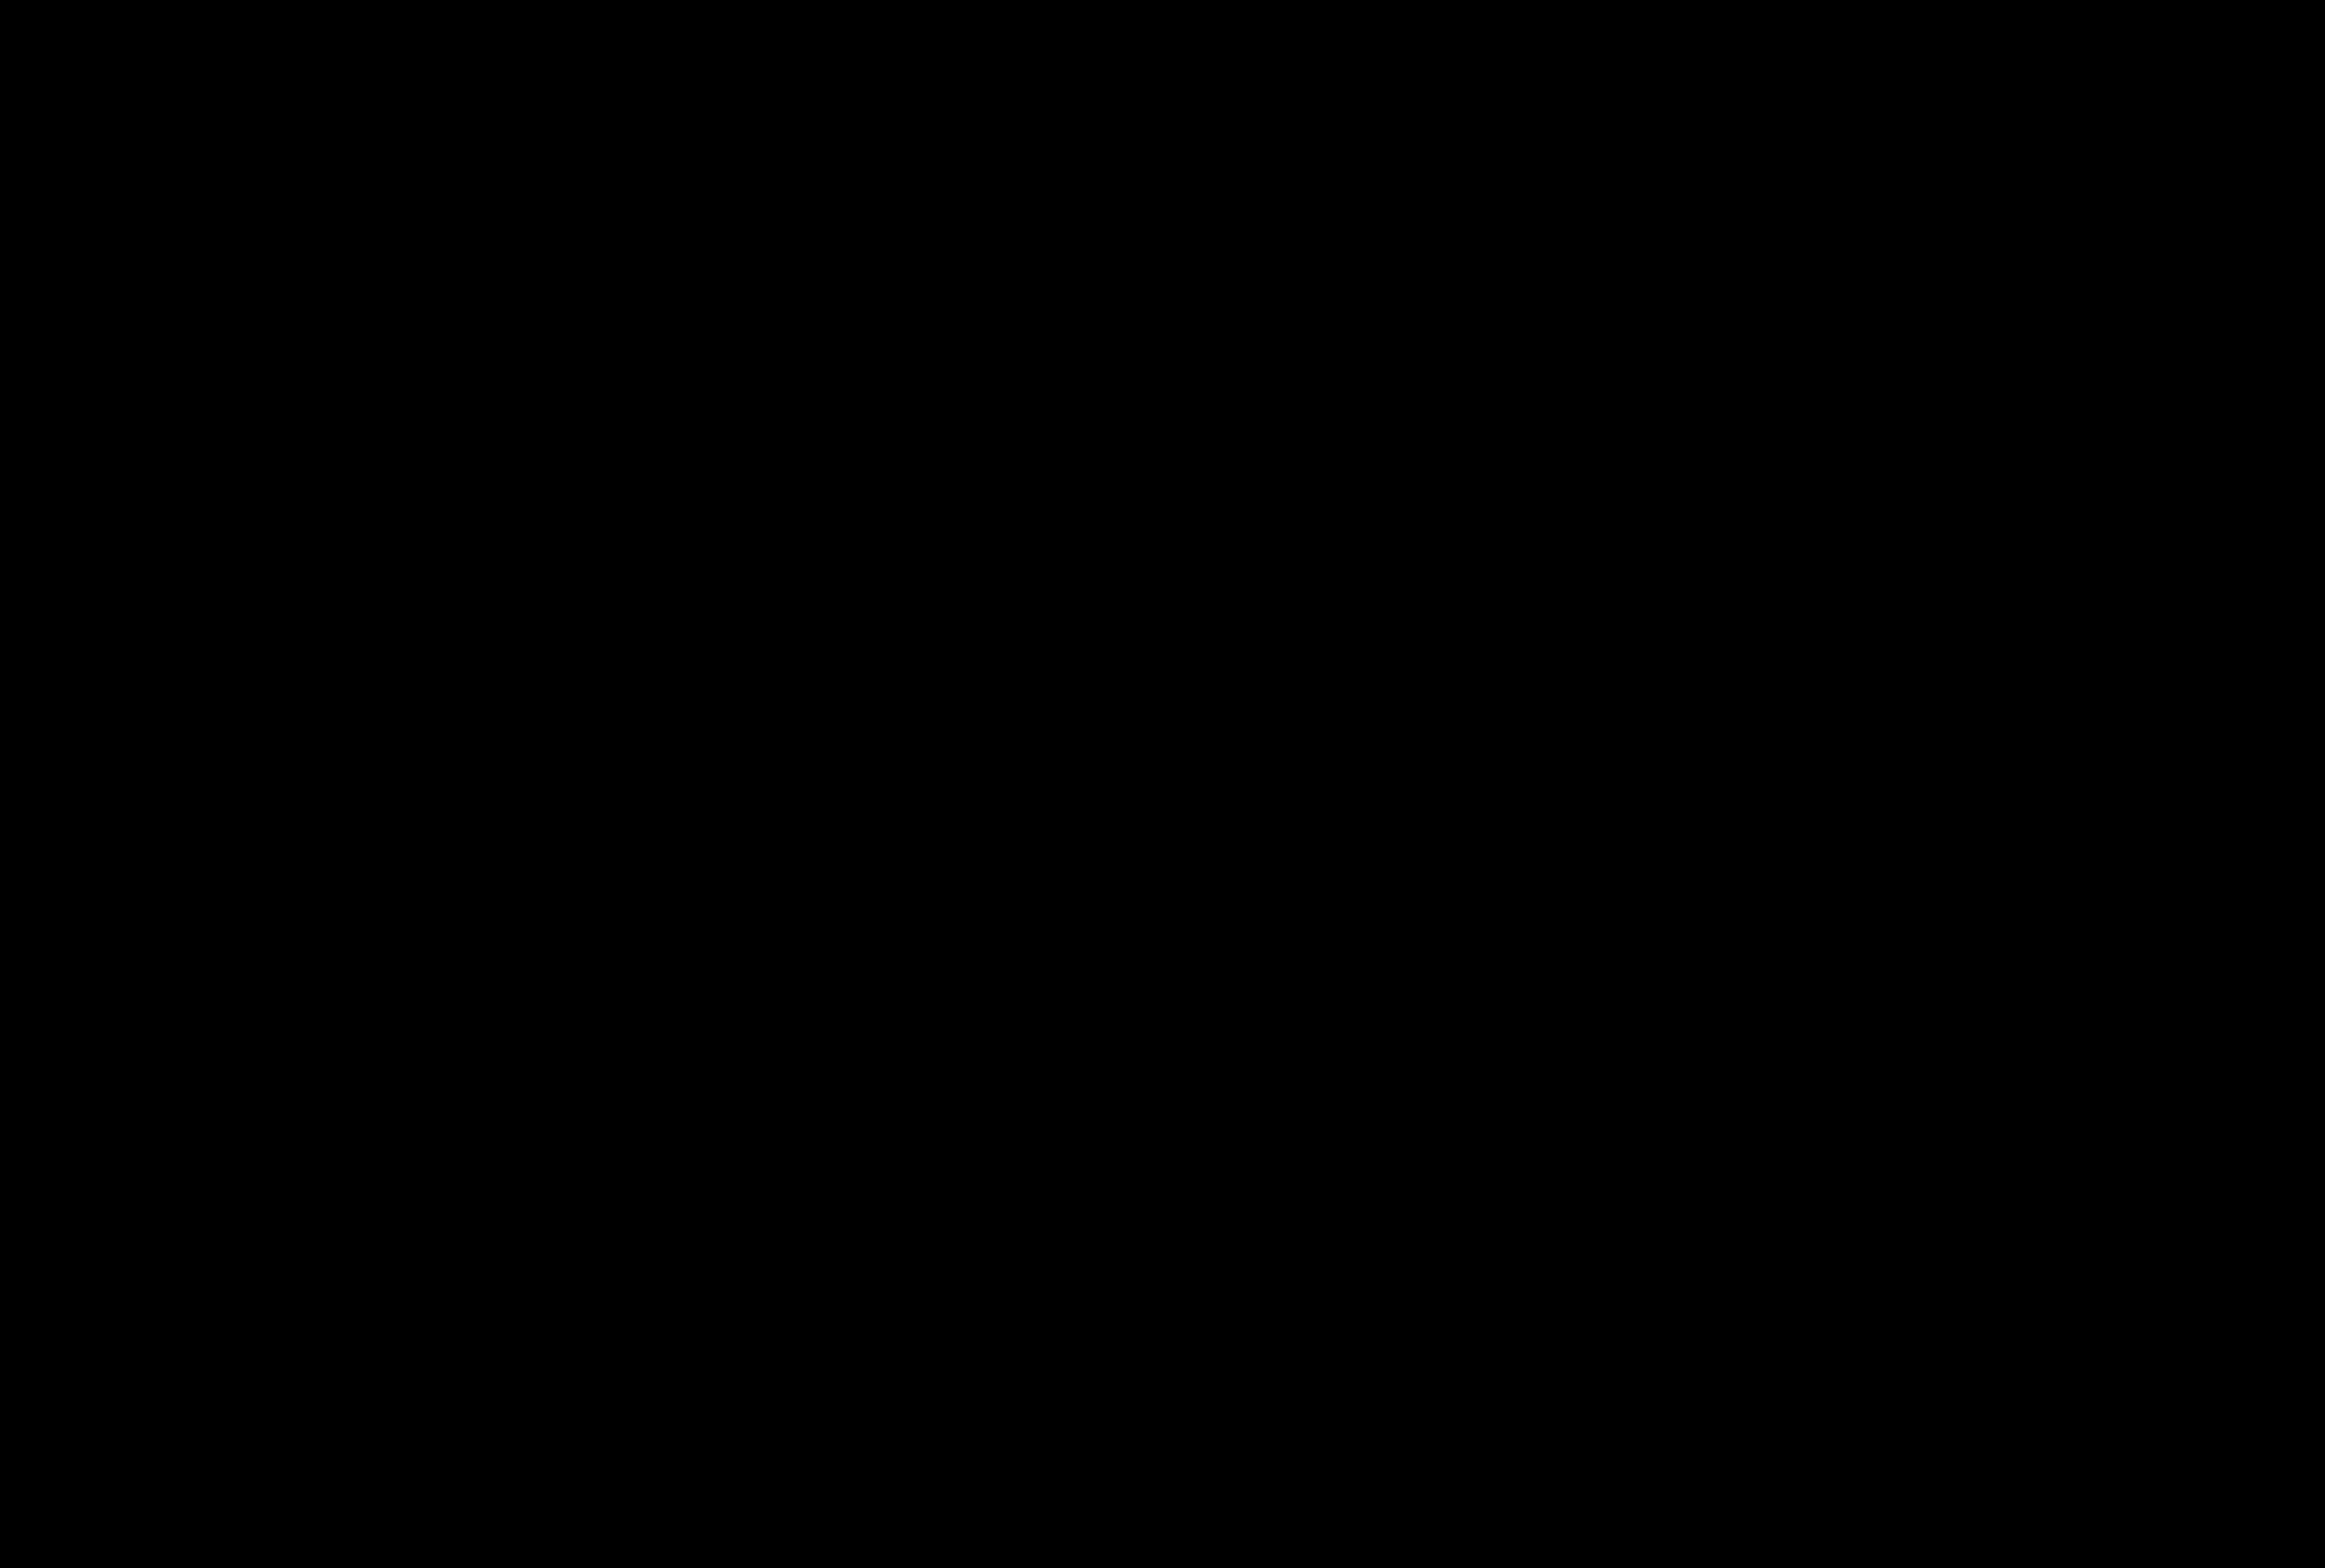 cartoon-crack-banner-2.png